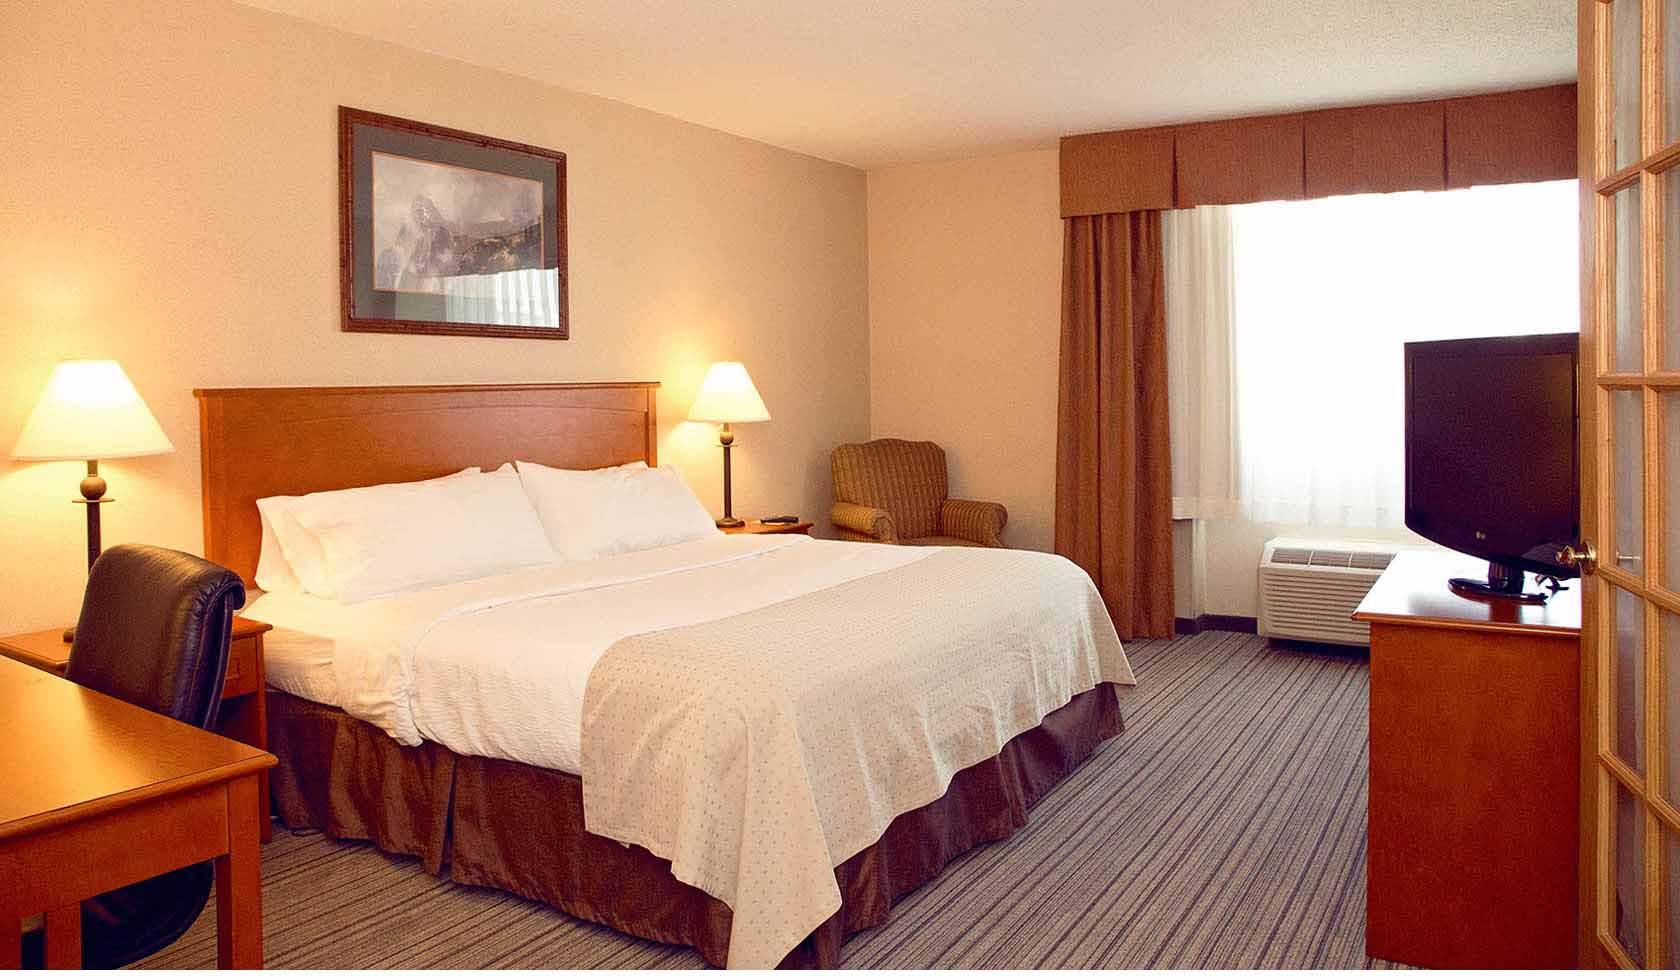 Holiday Inn Bozeman profile image